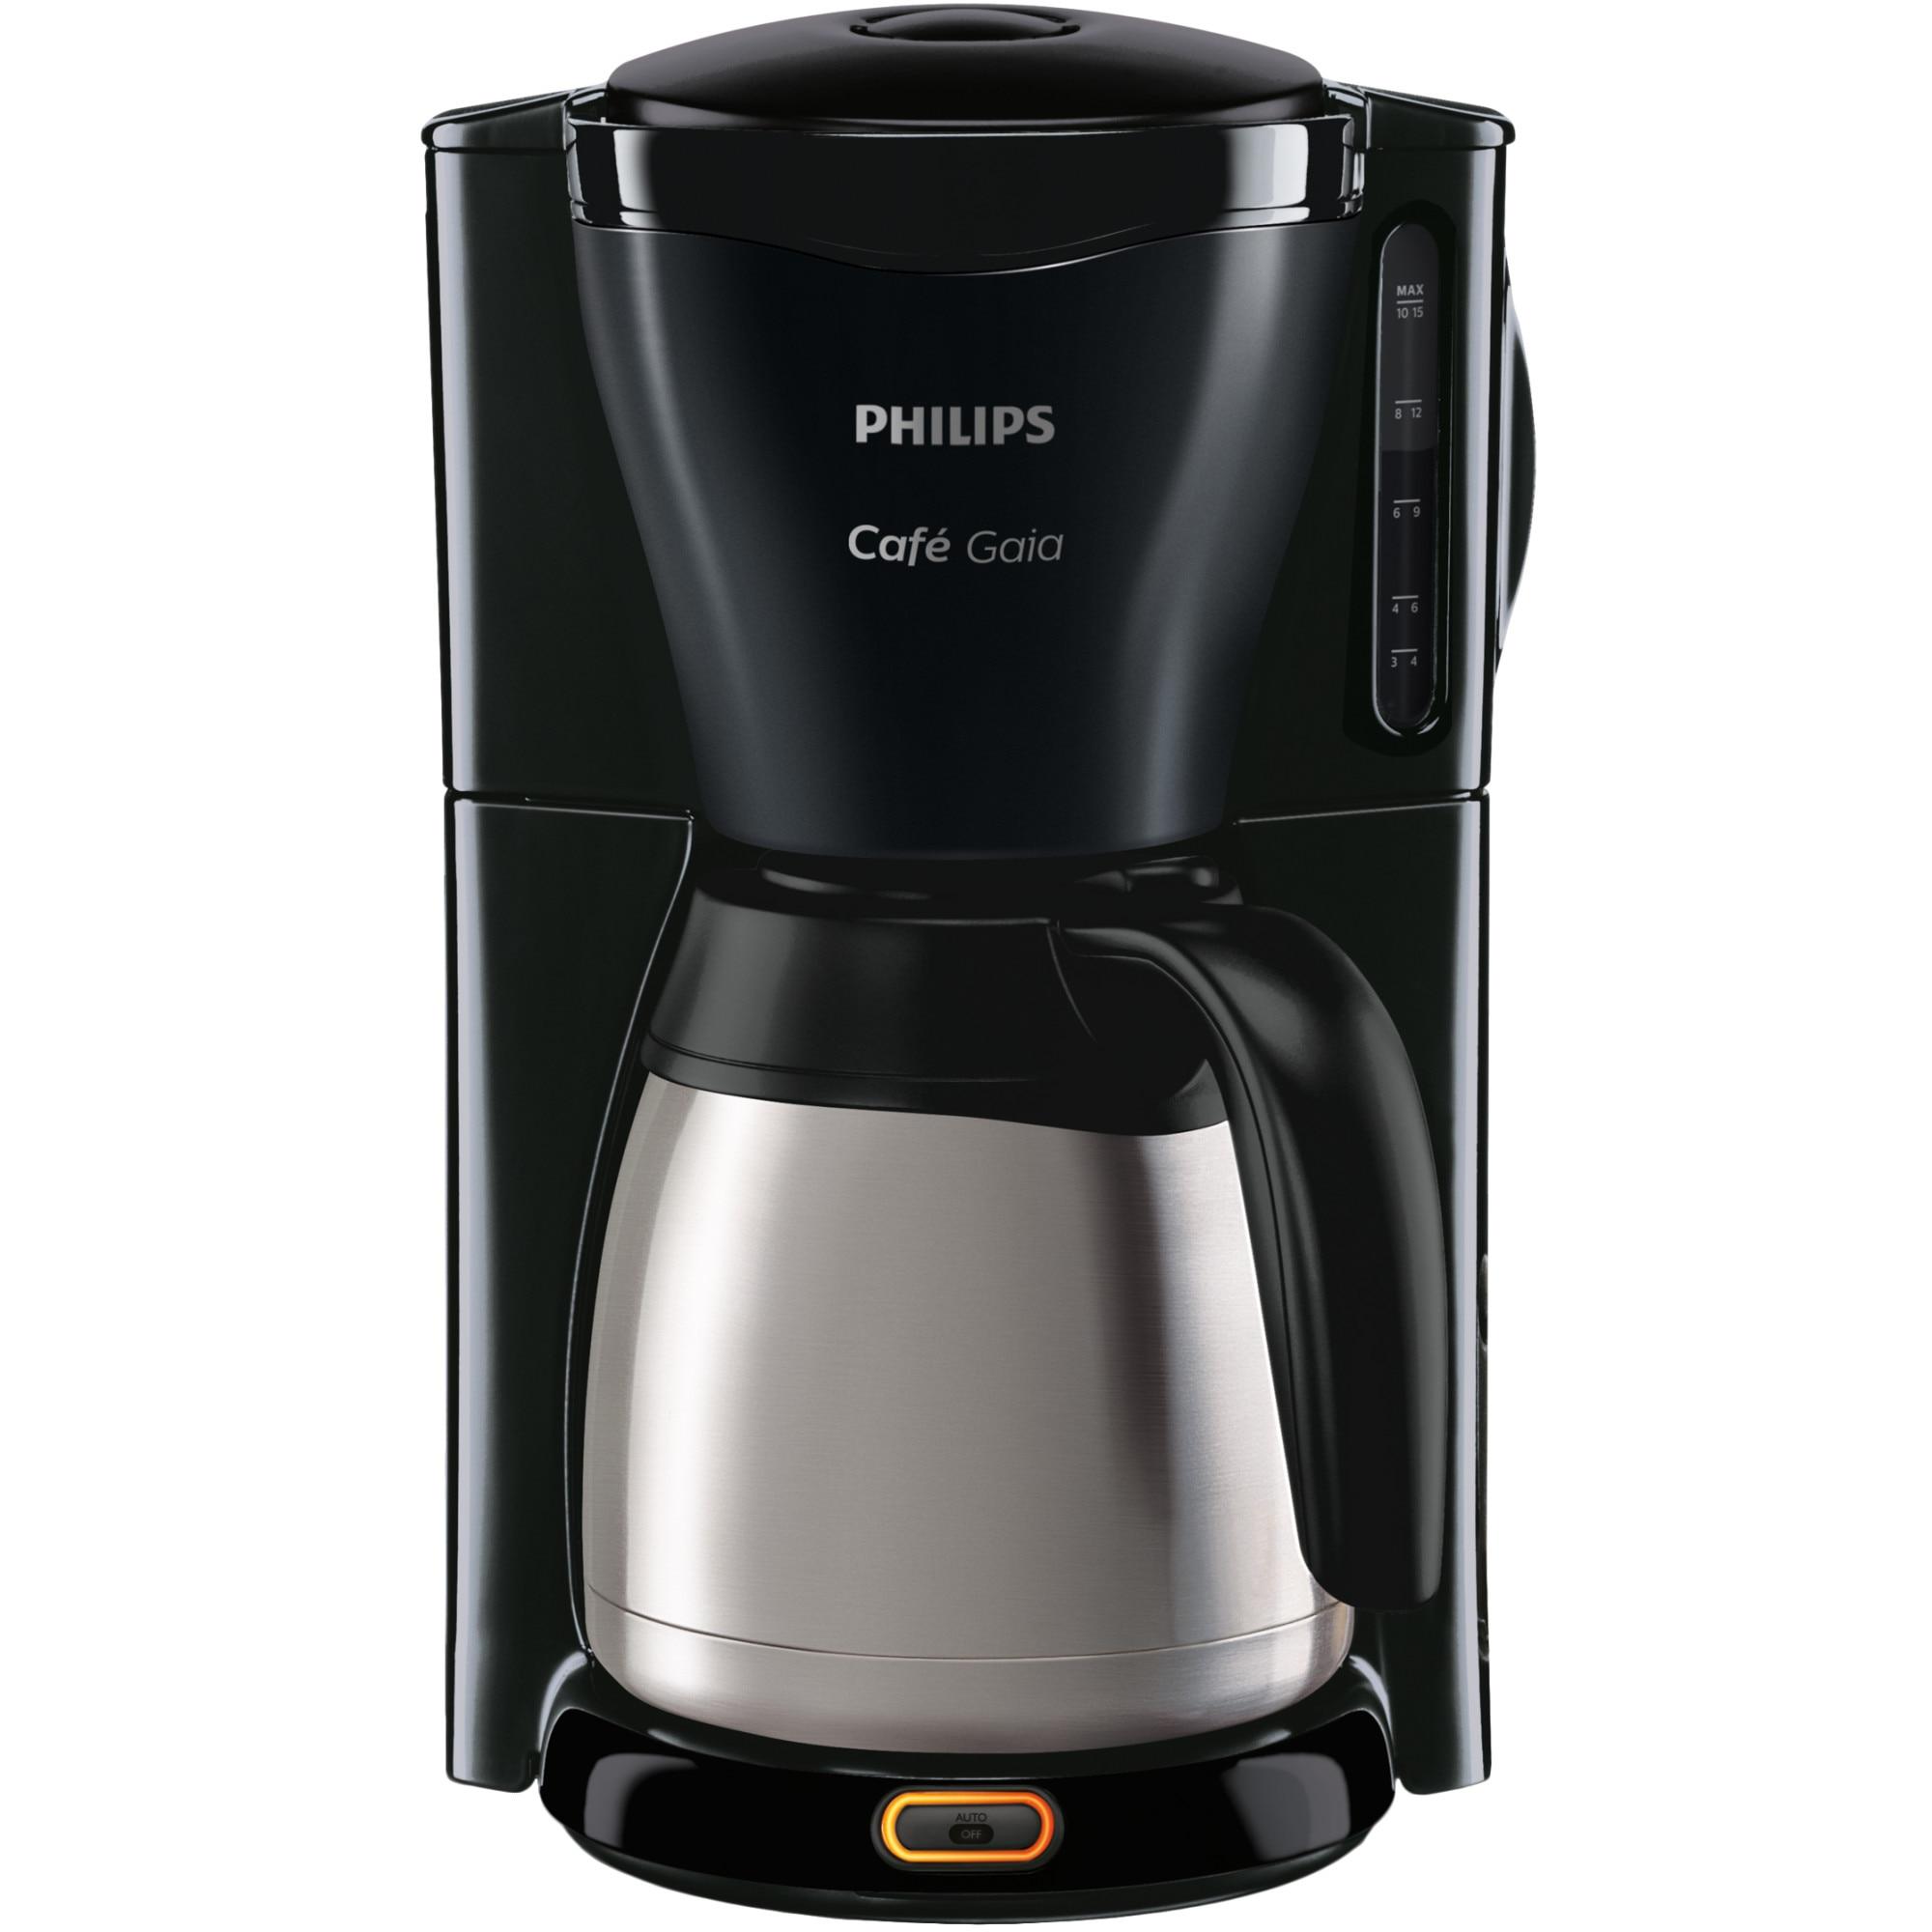 Fotografie Cafetiera Philips Gaia HD7544/20, 1000 W, vas termorezistent din otel inoxidabil, 1,2 l, sistem anti-picurare, negru